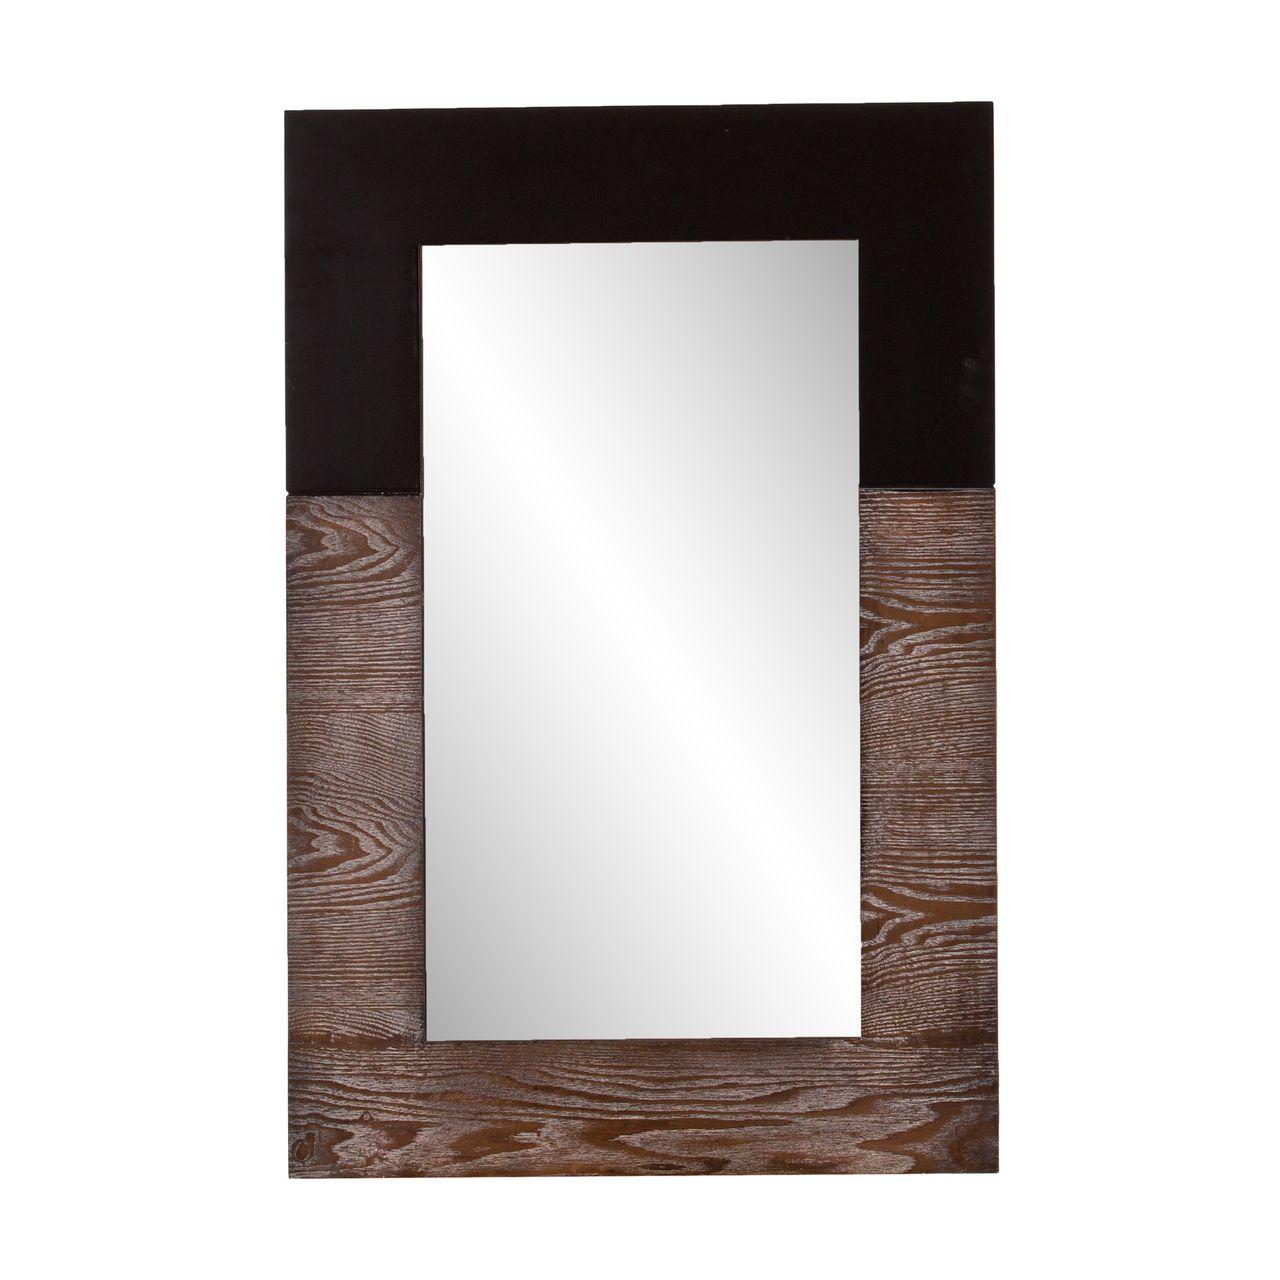 Holly & Martin Wagars Mirror in Burnt Oak/Black